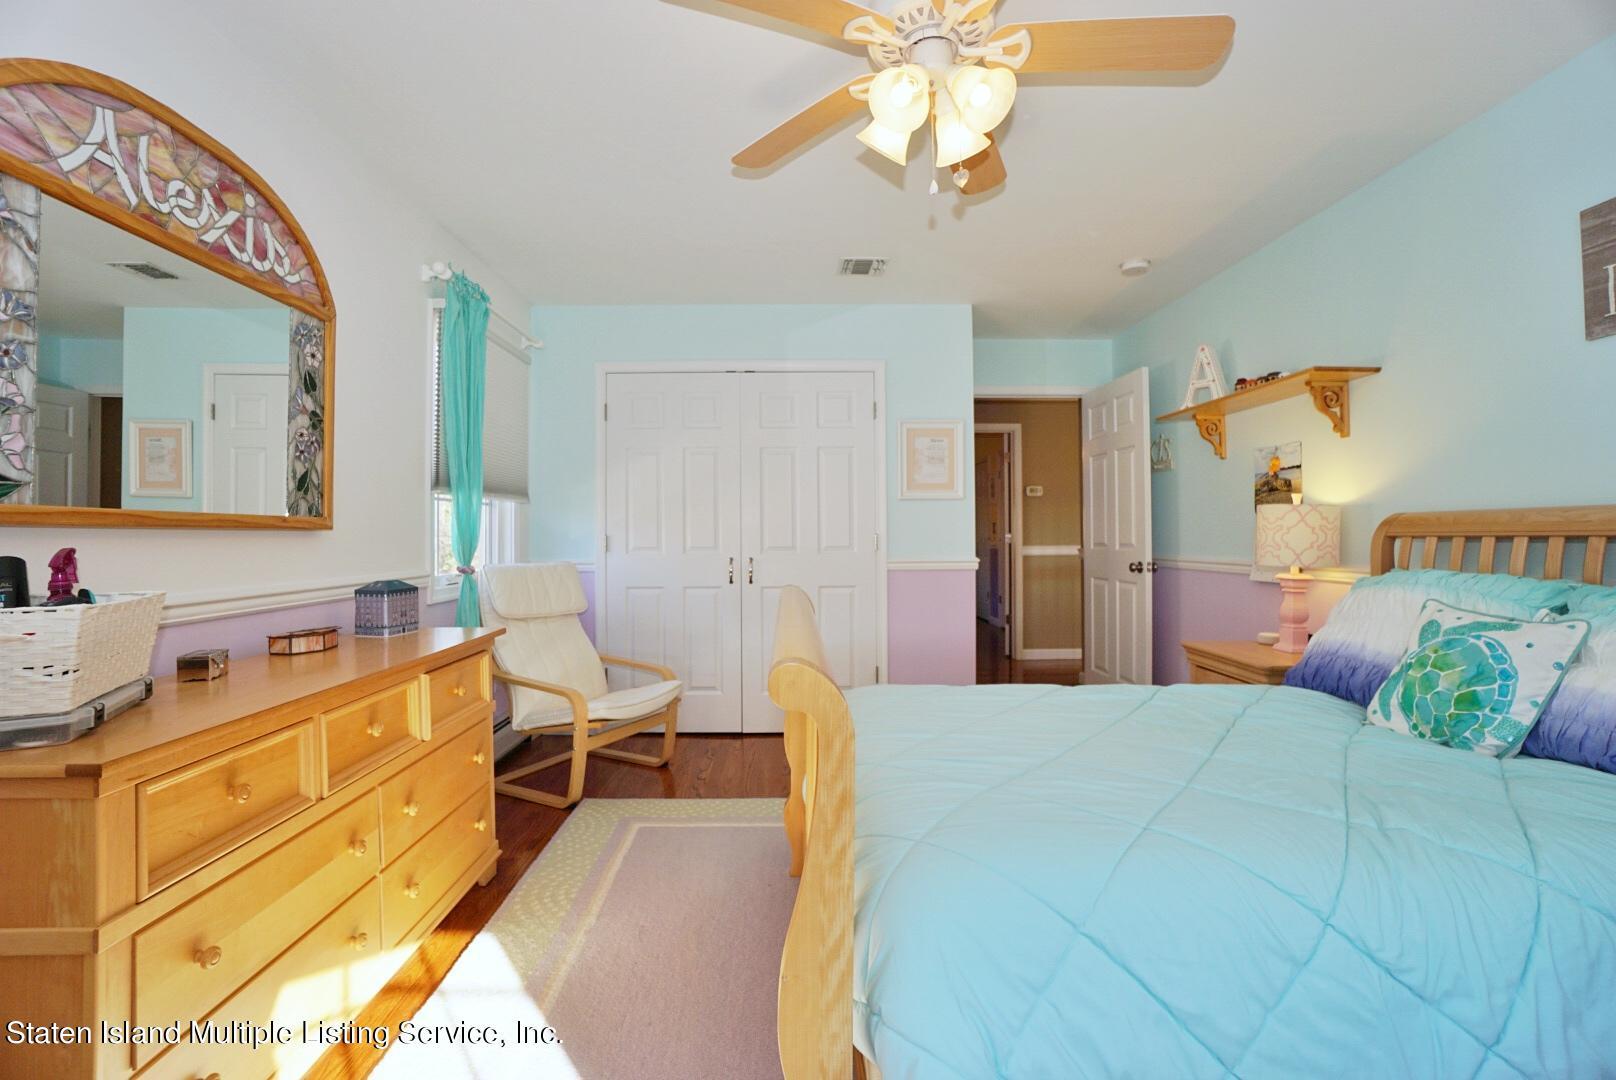 Single Family - Detached 31 Belwood Loop  Staten Island, NY 10307, MLS-1143133-45